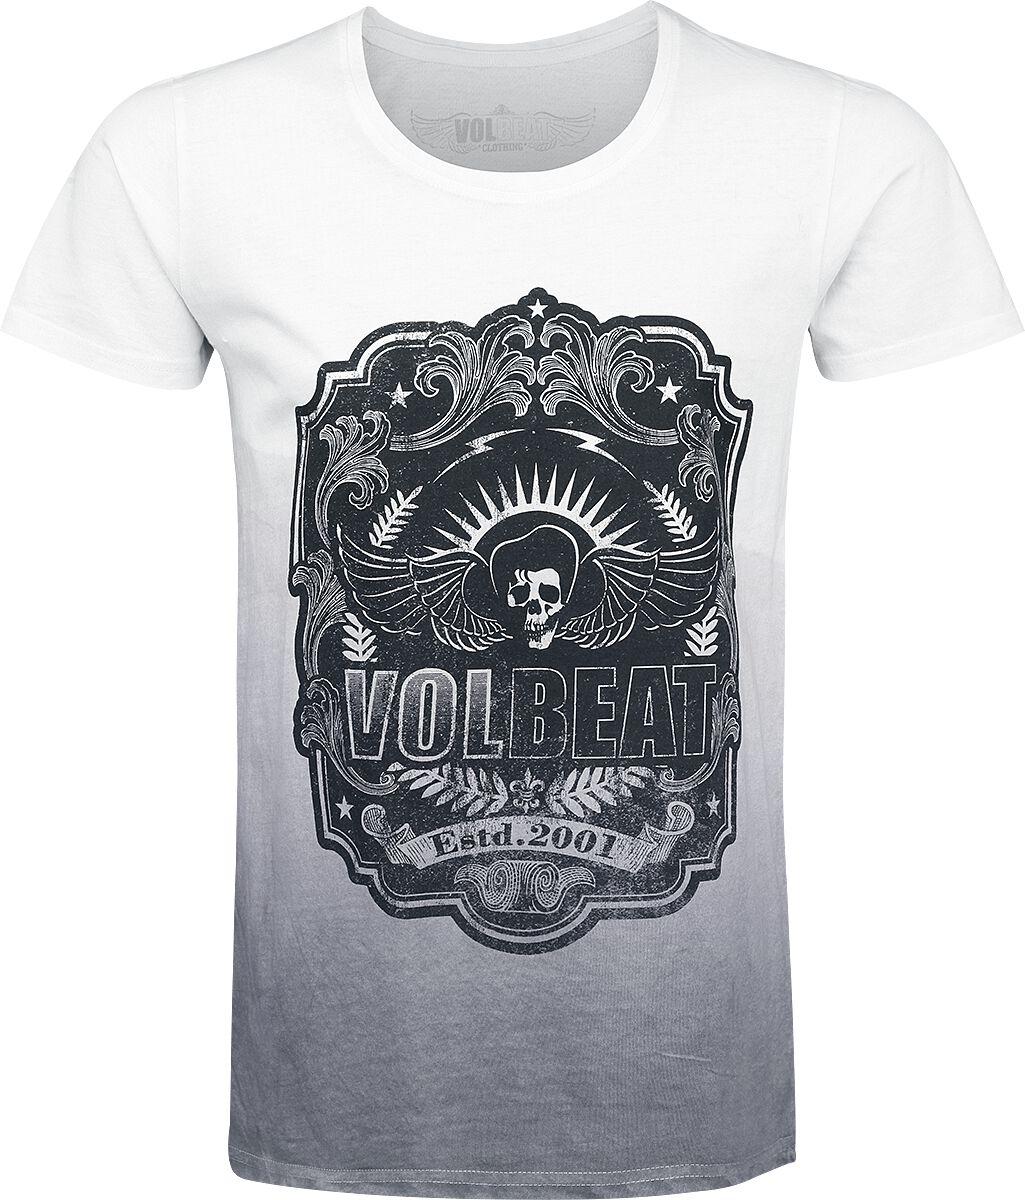 Image of   Volbeat Flourish T-Shirt hvid-grå